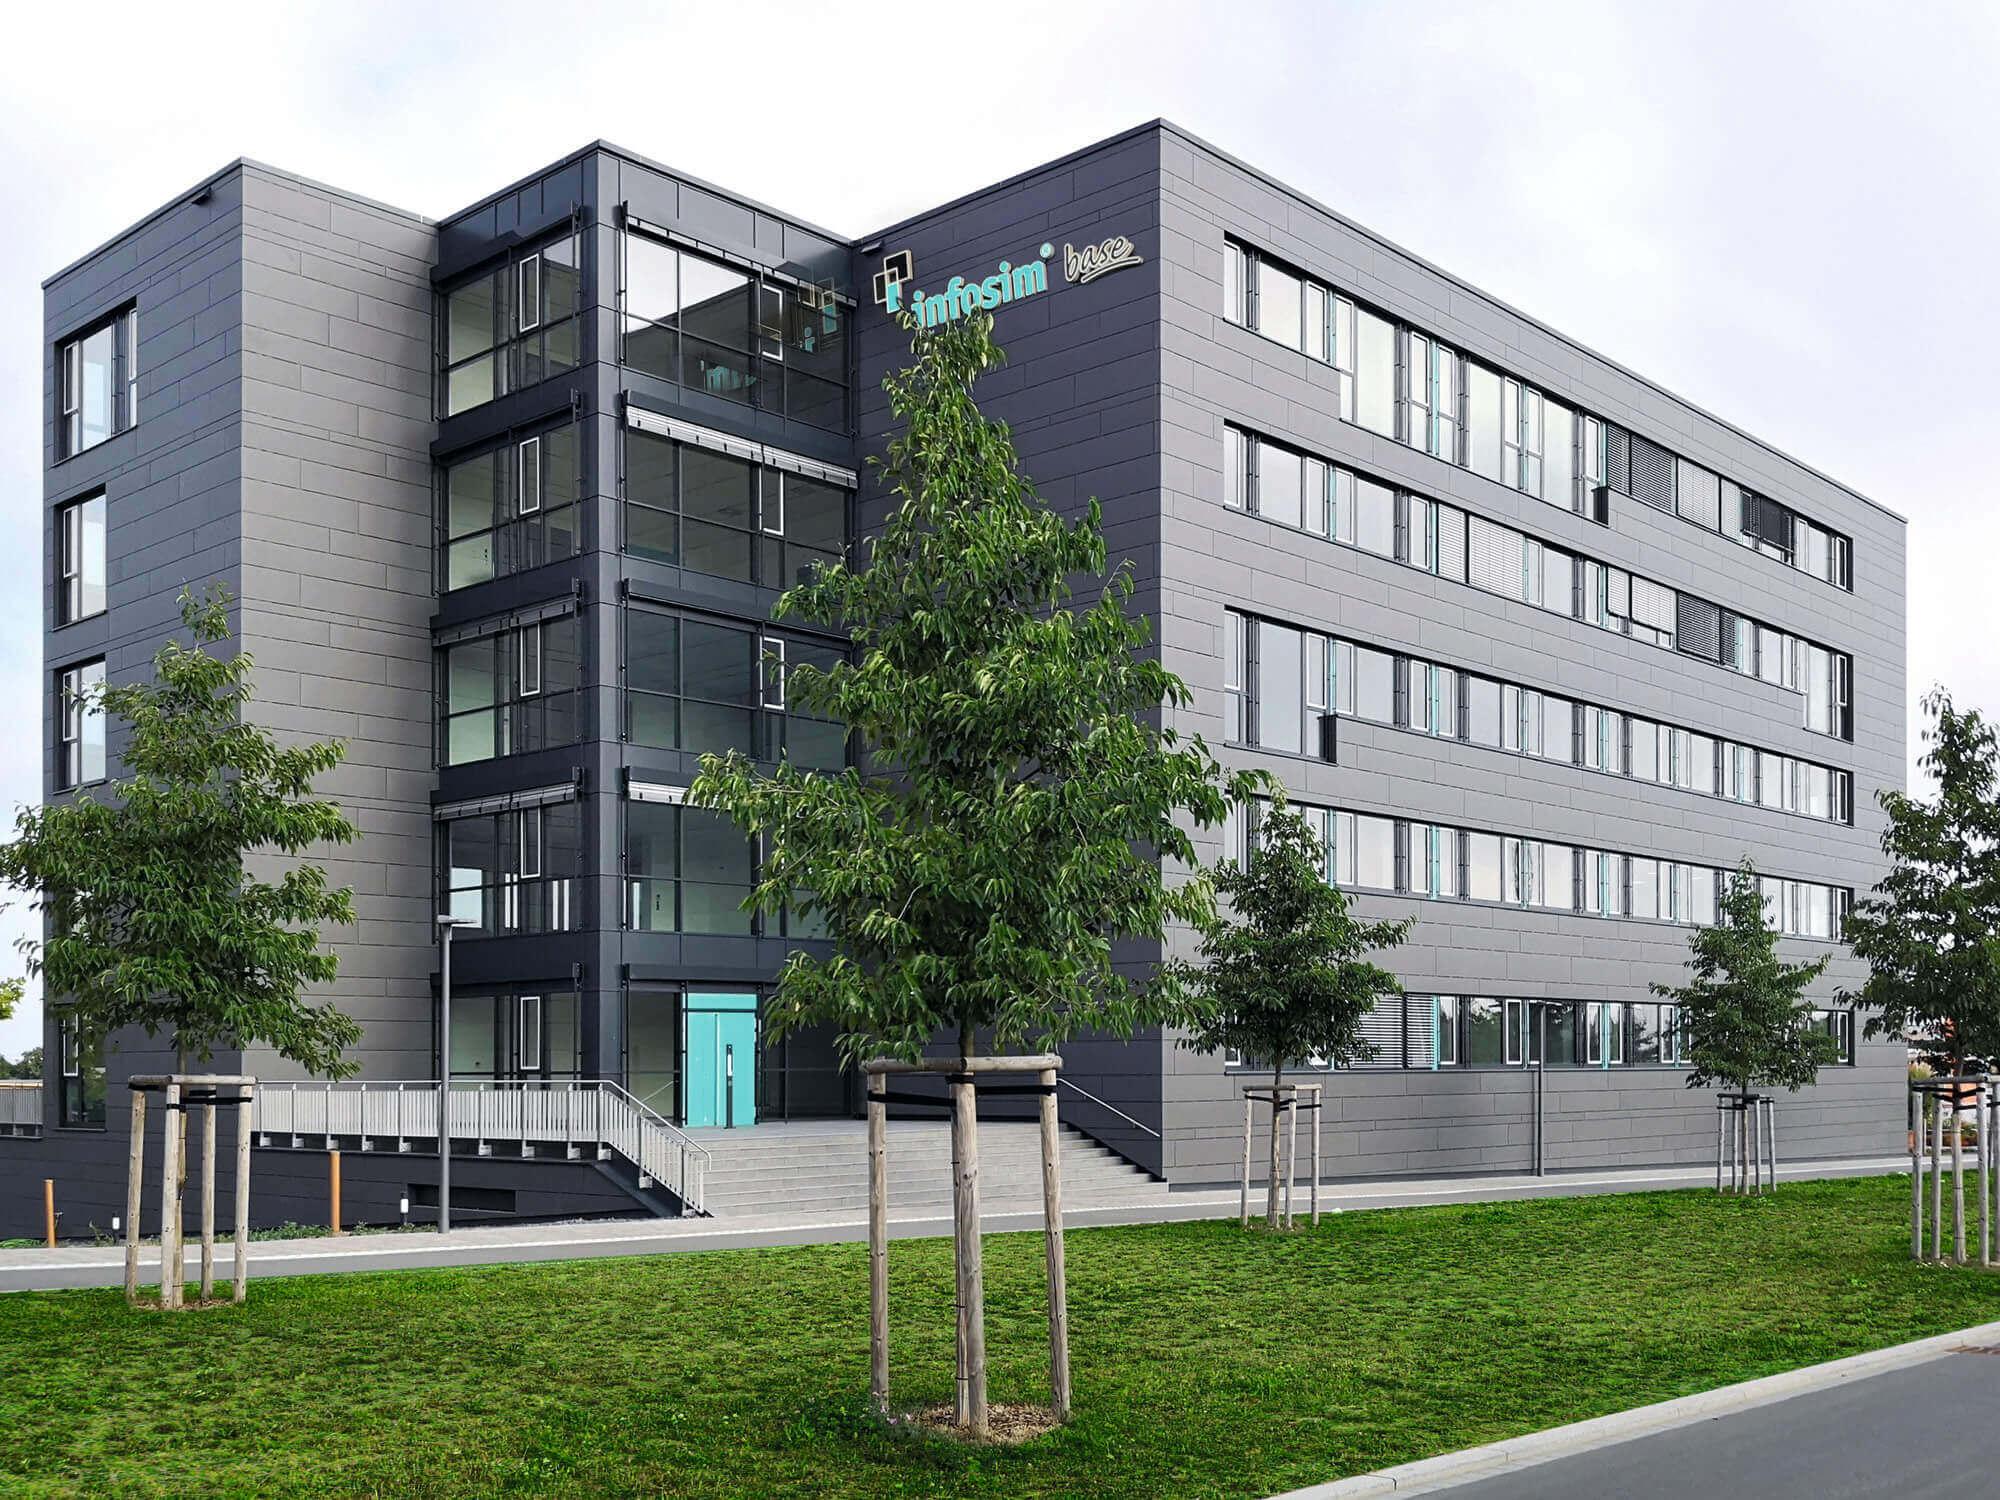 Infosim headquarter Würzburg